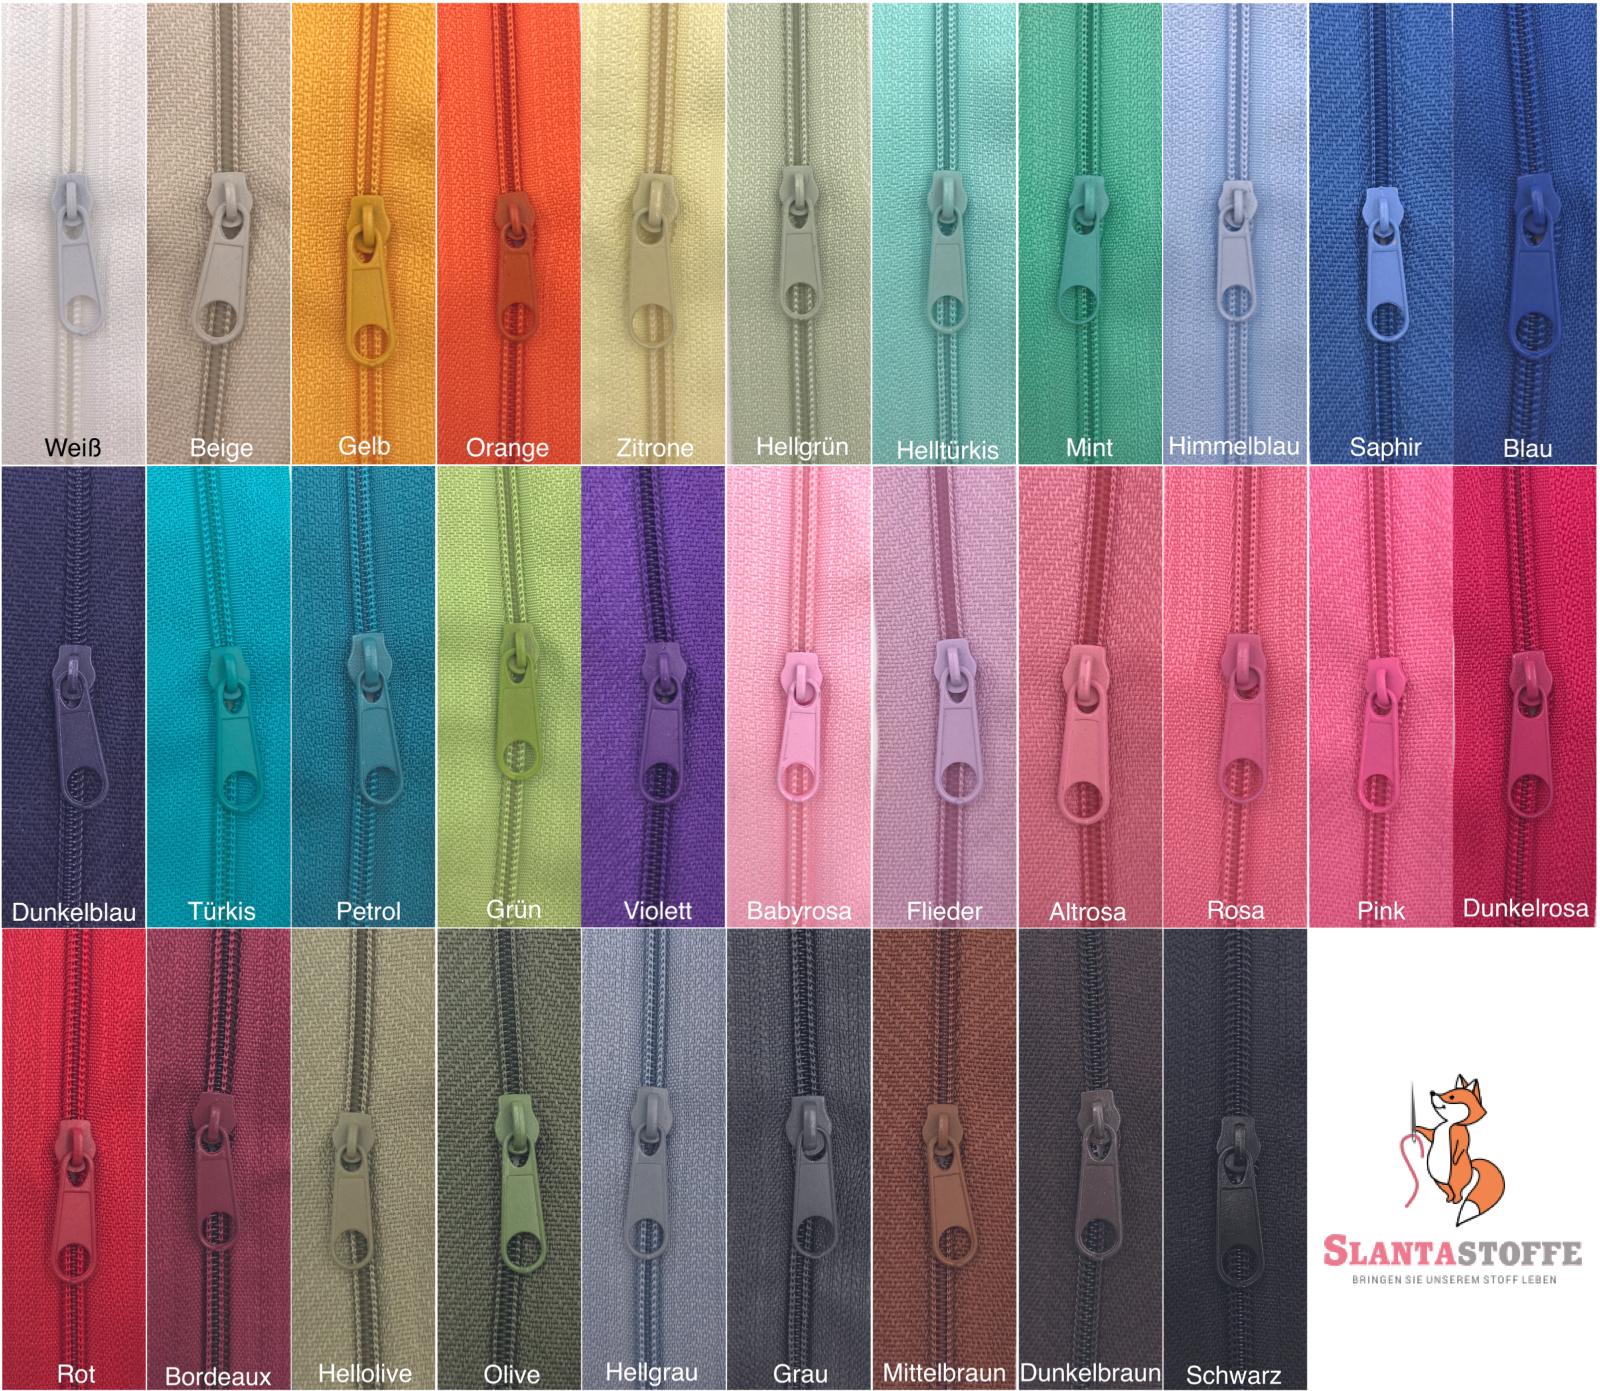 Meterware 2 Schieber//Zipper 15 Farben Spirale 5mm Reißverschluss endlos